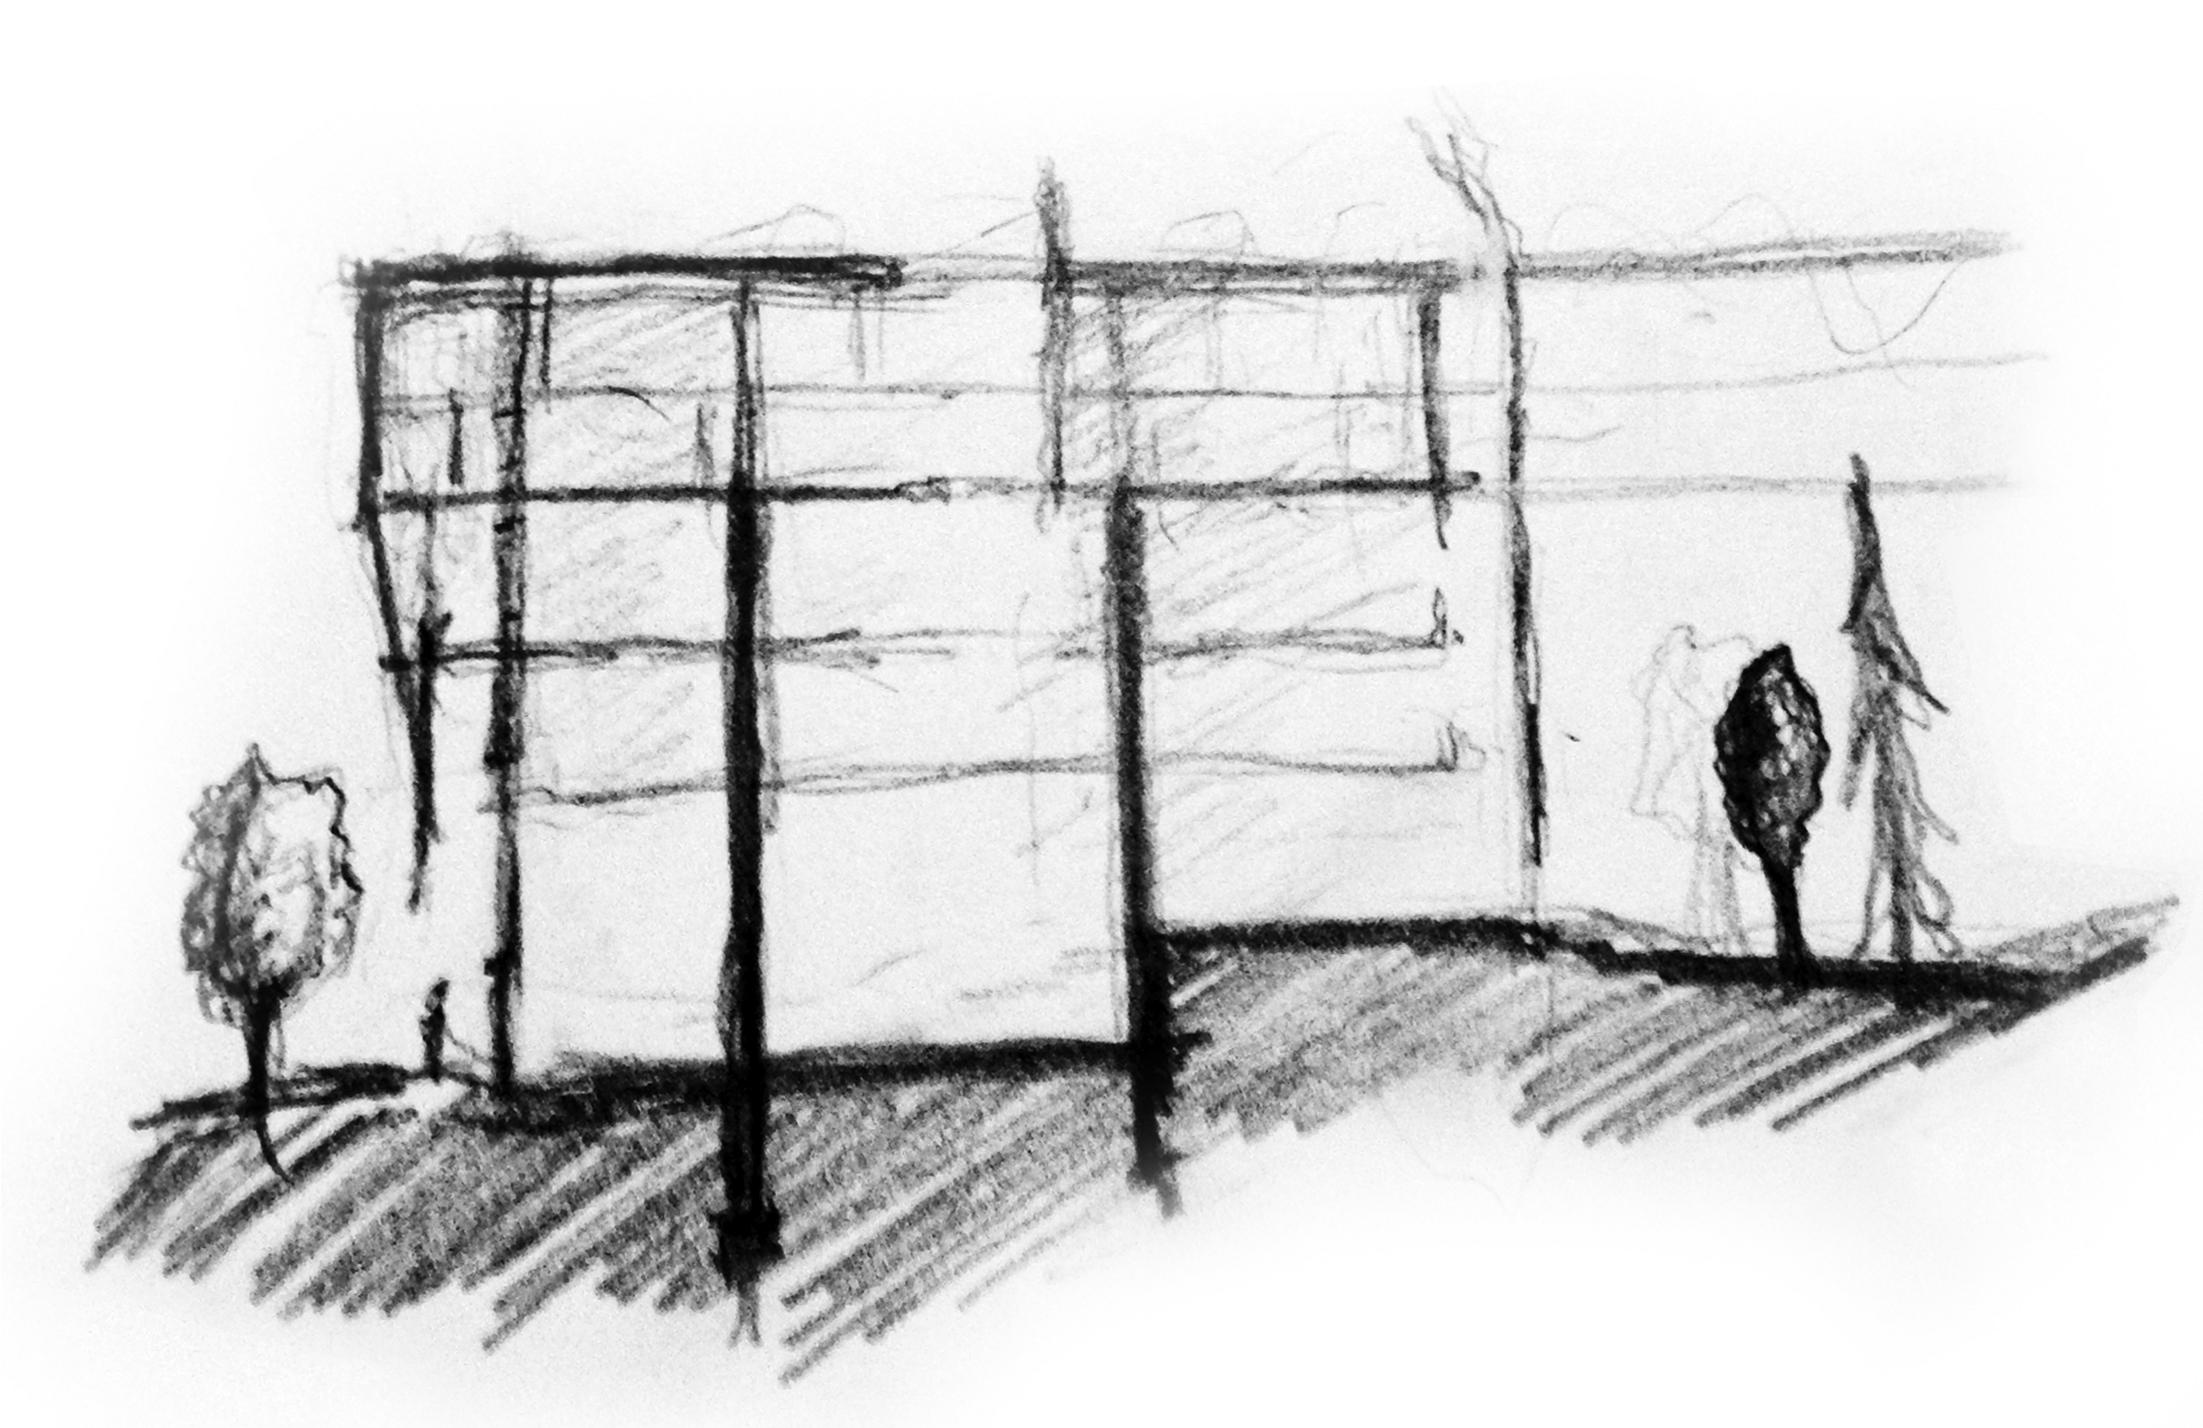 bldgdiagram_sketch.jpg